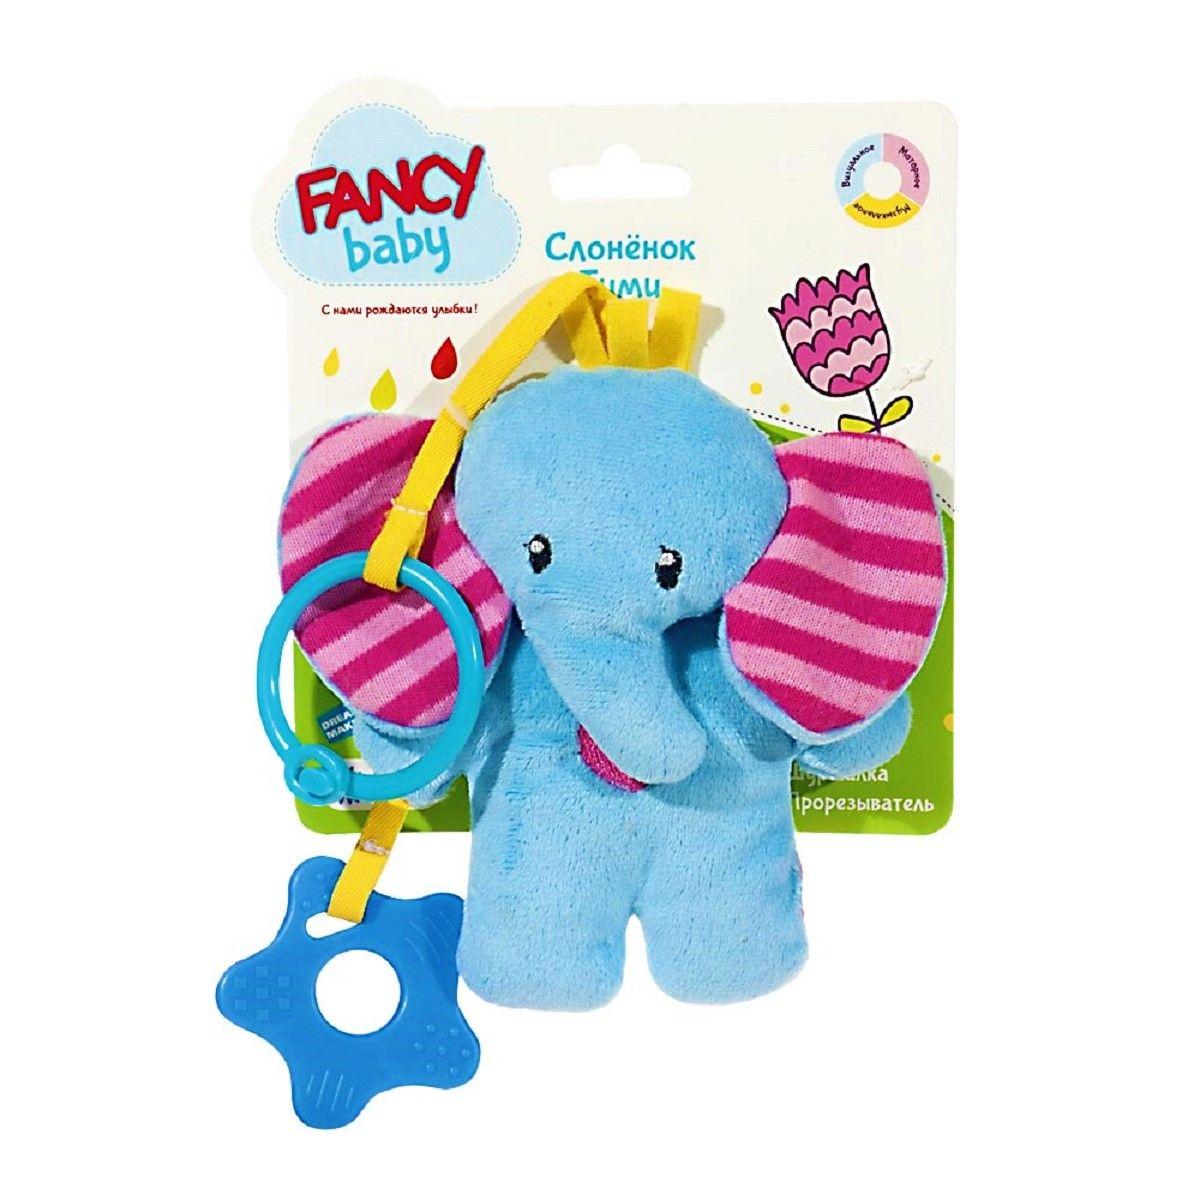 Fancy Развивающая игрушка Слоненок Тими